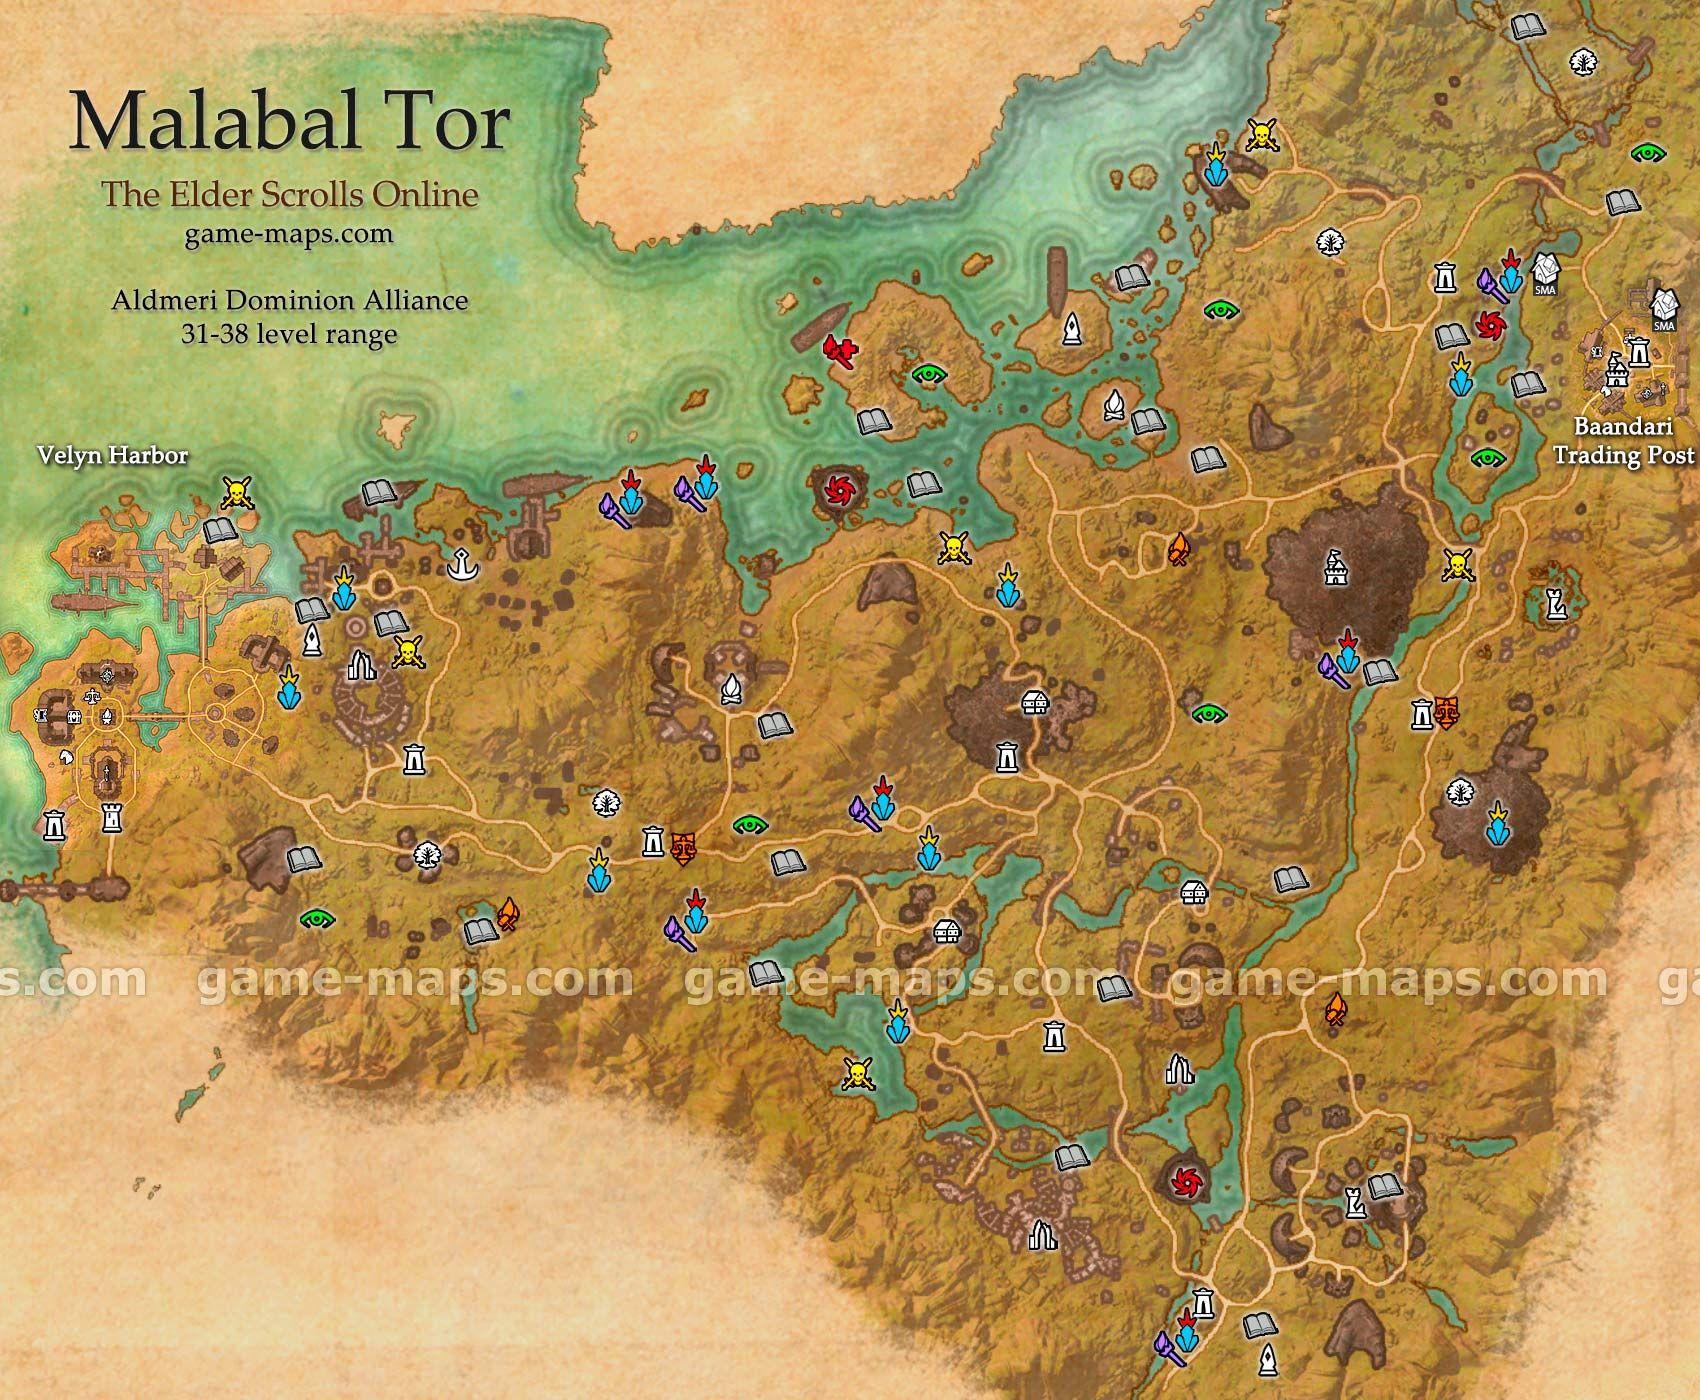 Malabal Tor zone map Velyn Harbor Baandari Trading Post Deepest